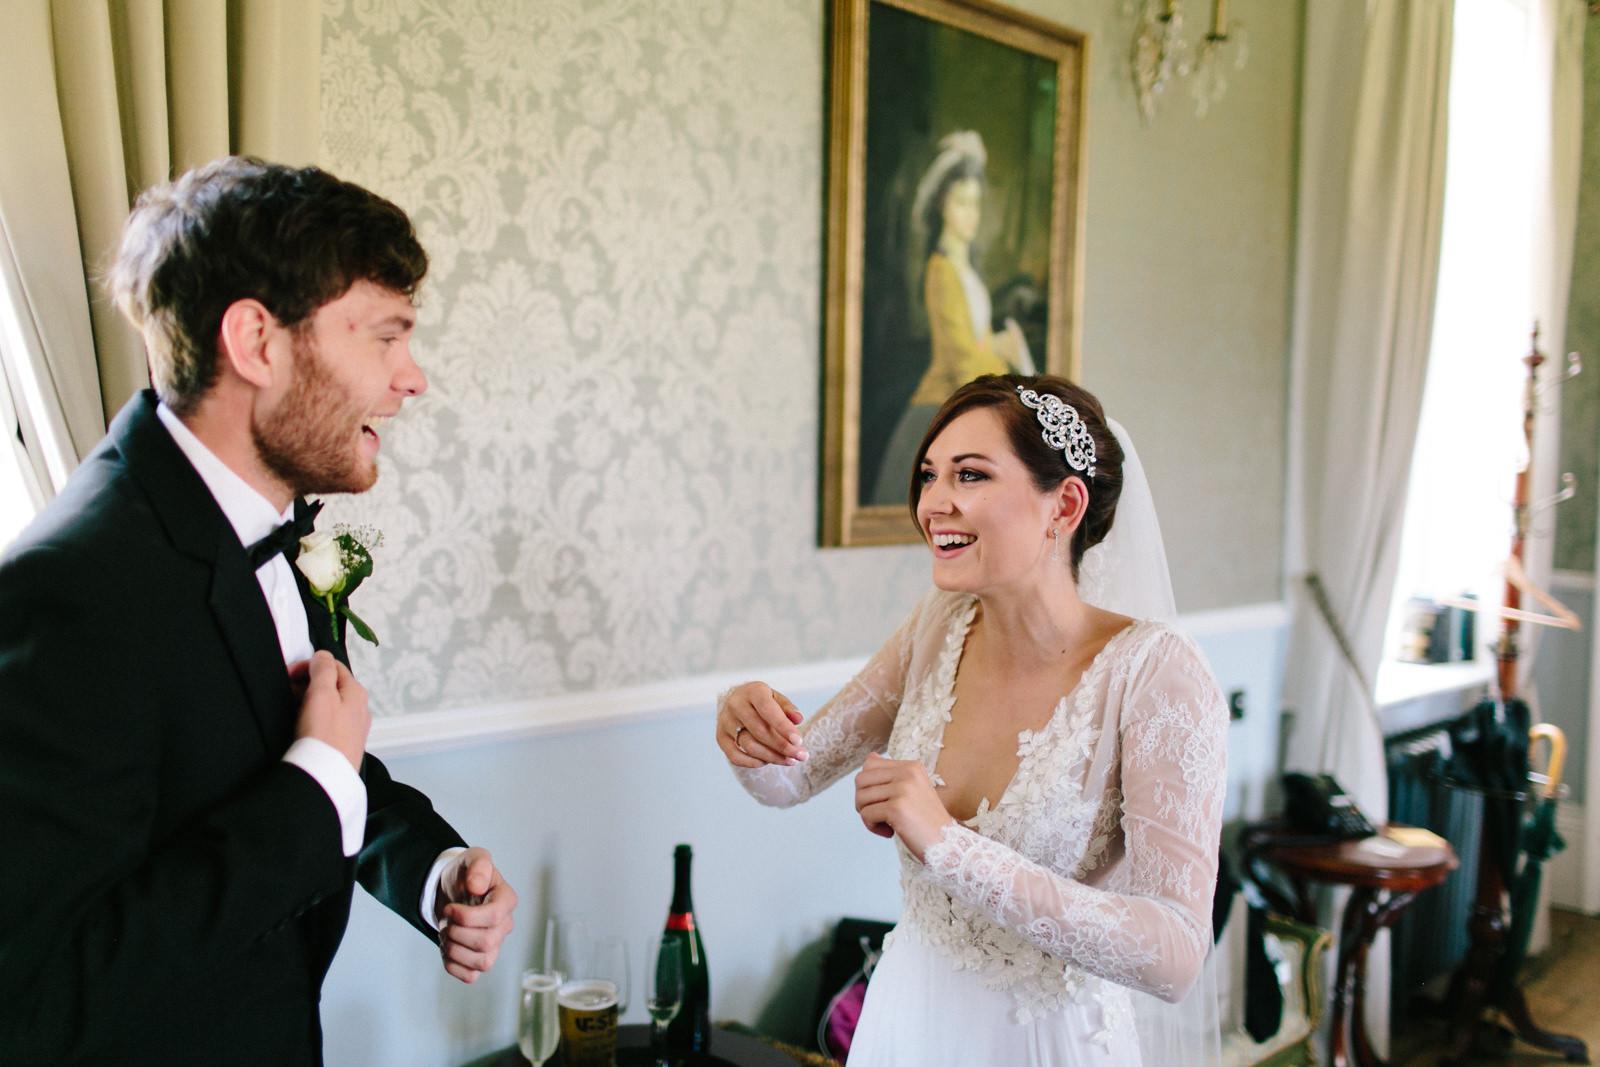 Stanbrooke Abbey Wedding Photographer-321827.jpg